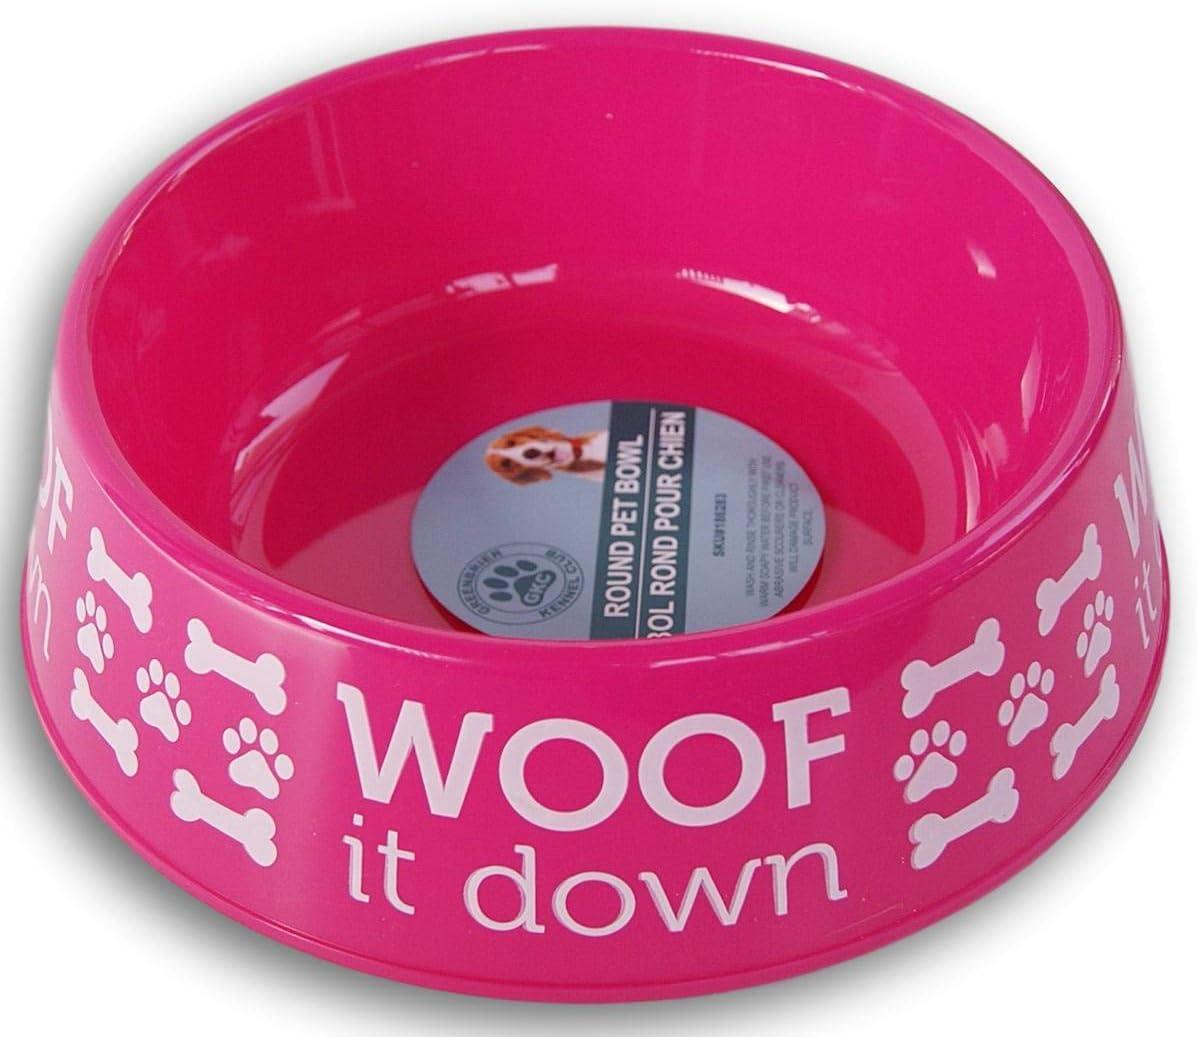 Retail Hot Pink Plastic 6-Cup Capacity Bone Pattern Dog Bowl - 8.5'' x 3''